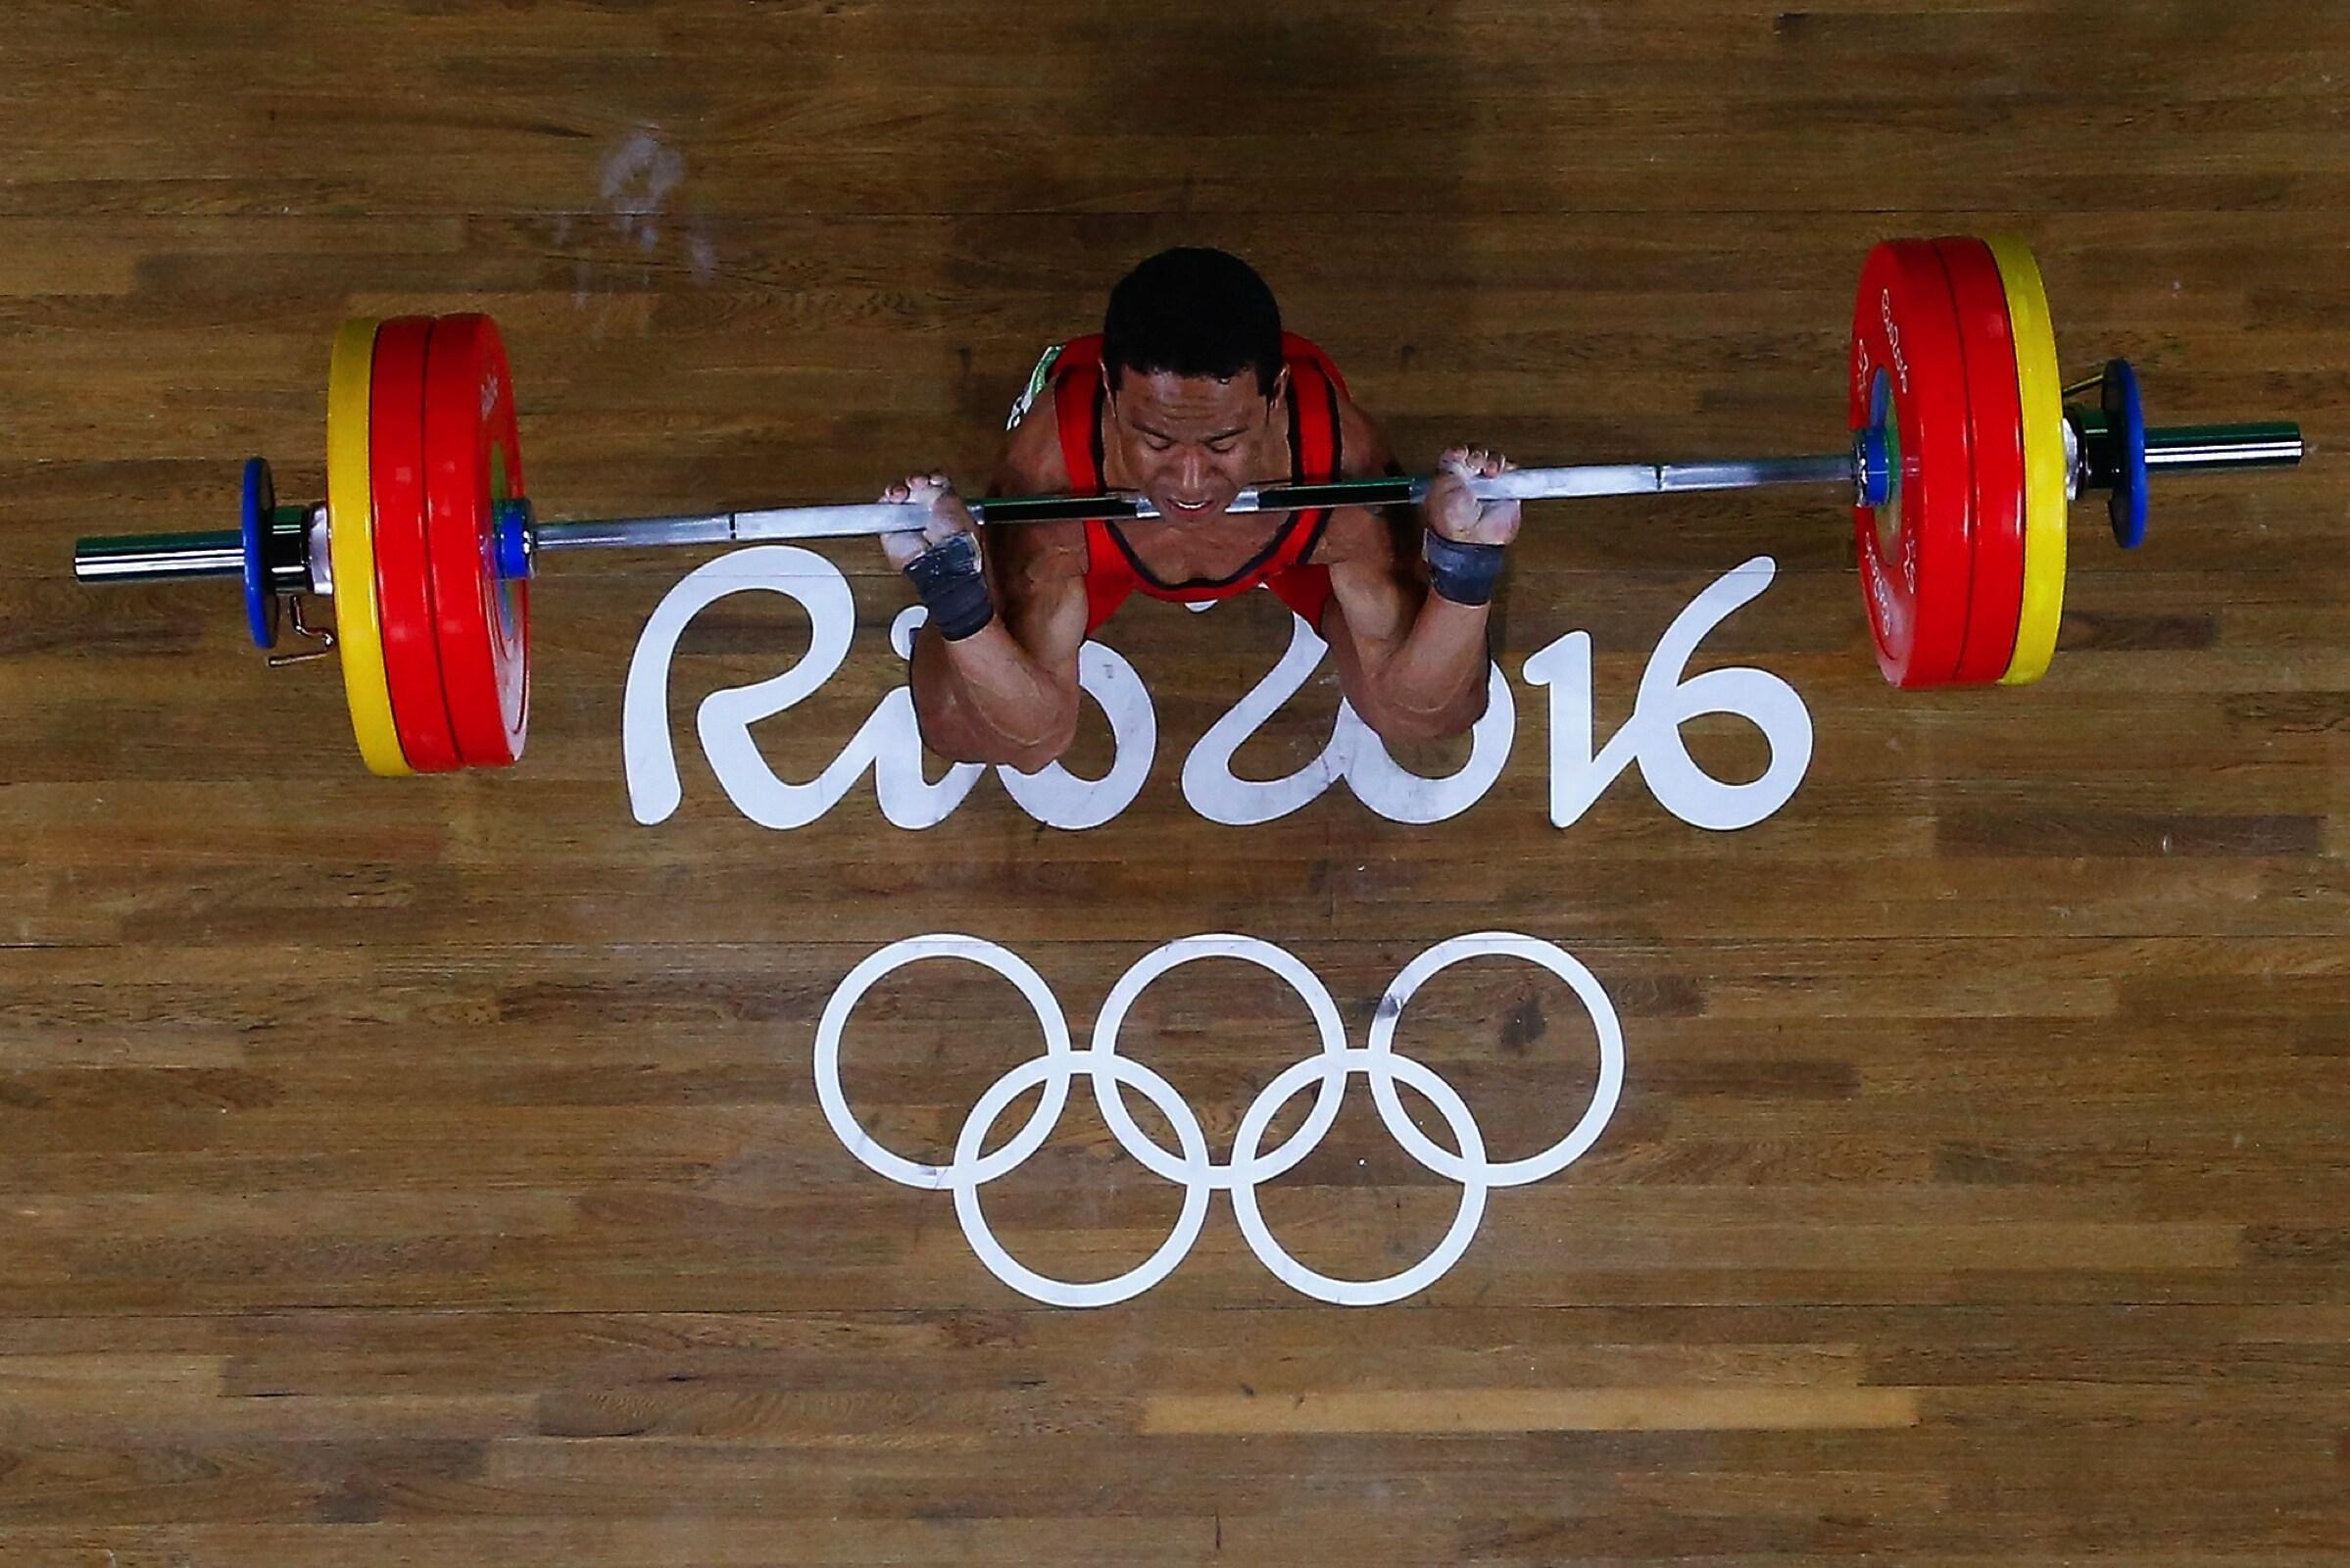 Weightlifting - Men's 62kg